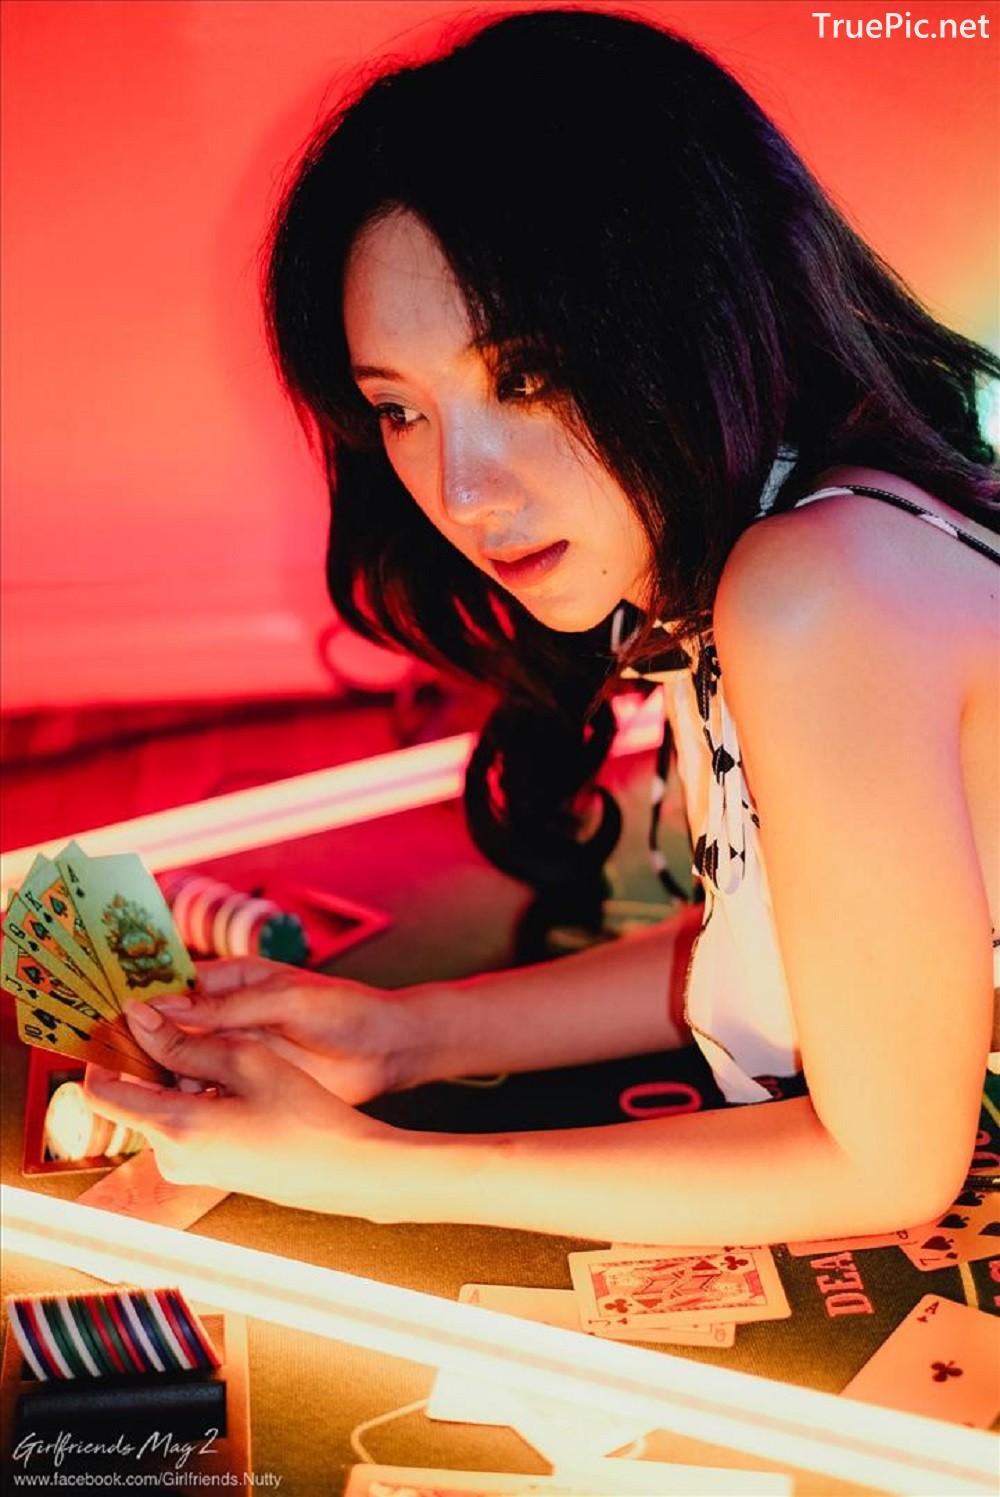 Image-Thailand-Beautiful-Model-Piyatida-Rotjutharak-Sexy-Gambling-Girl-TruePic.net- Picture-10